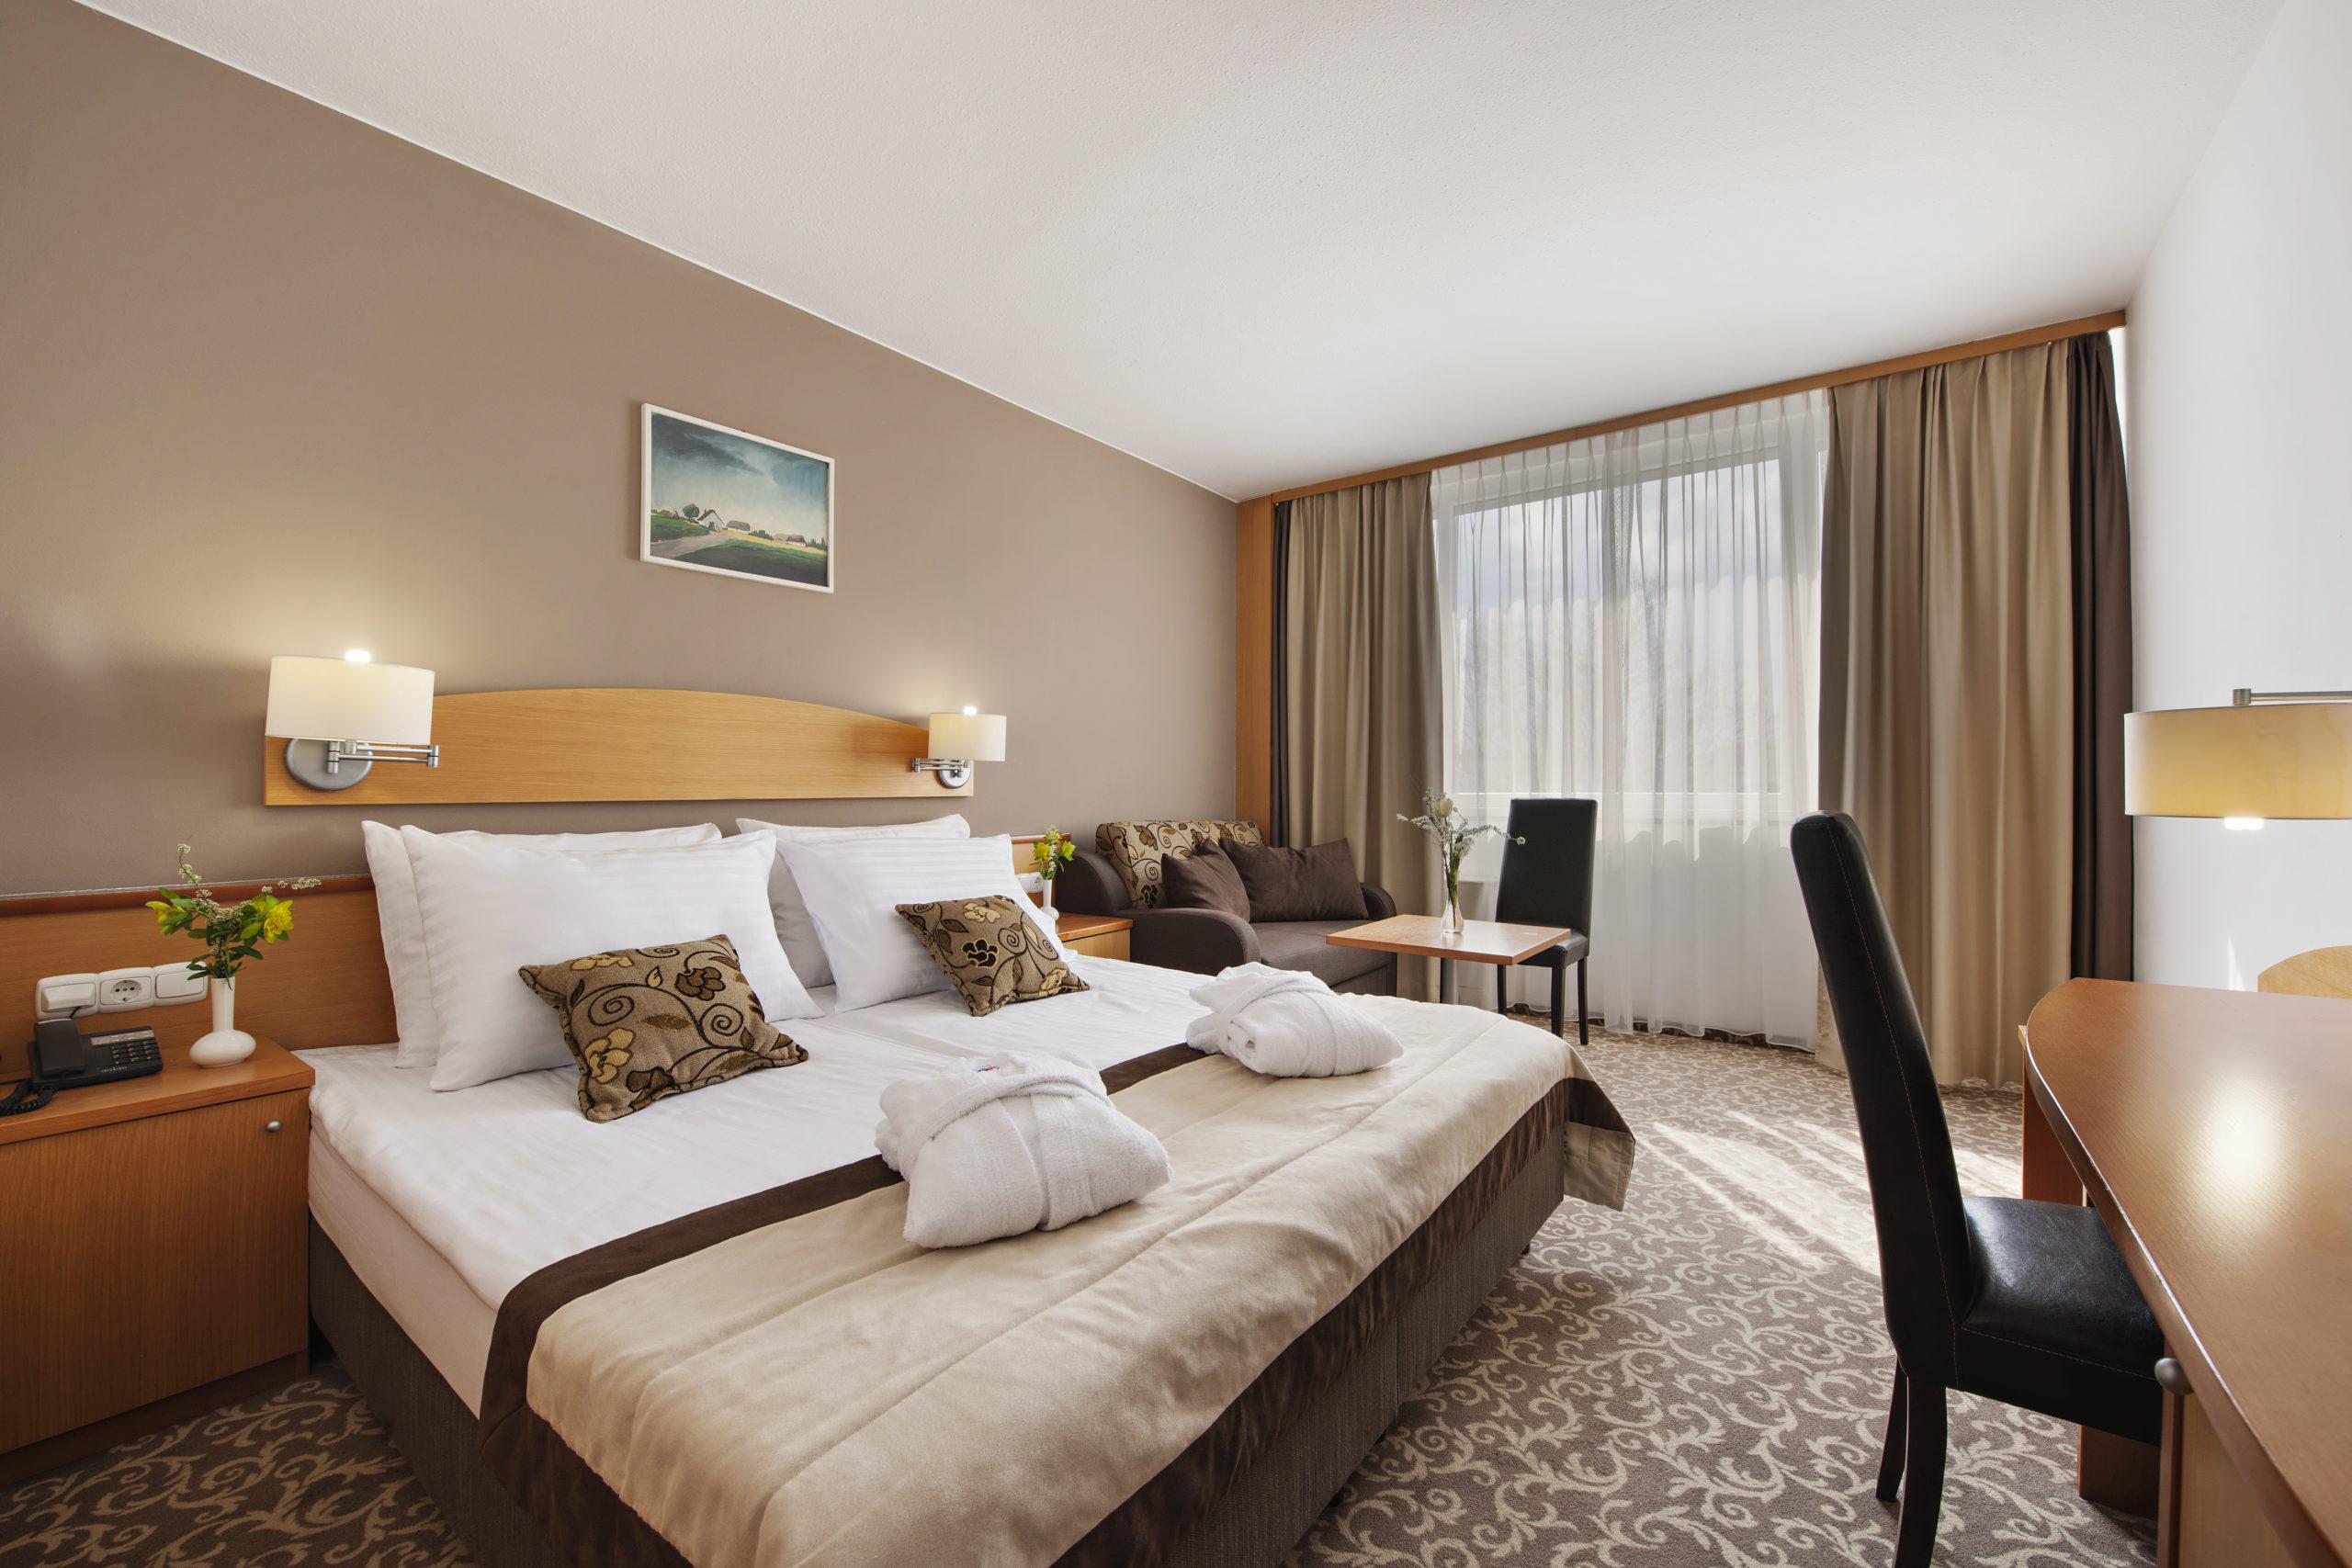 HotelTermal_DoubleRoom_01_052017_DD